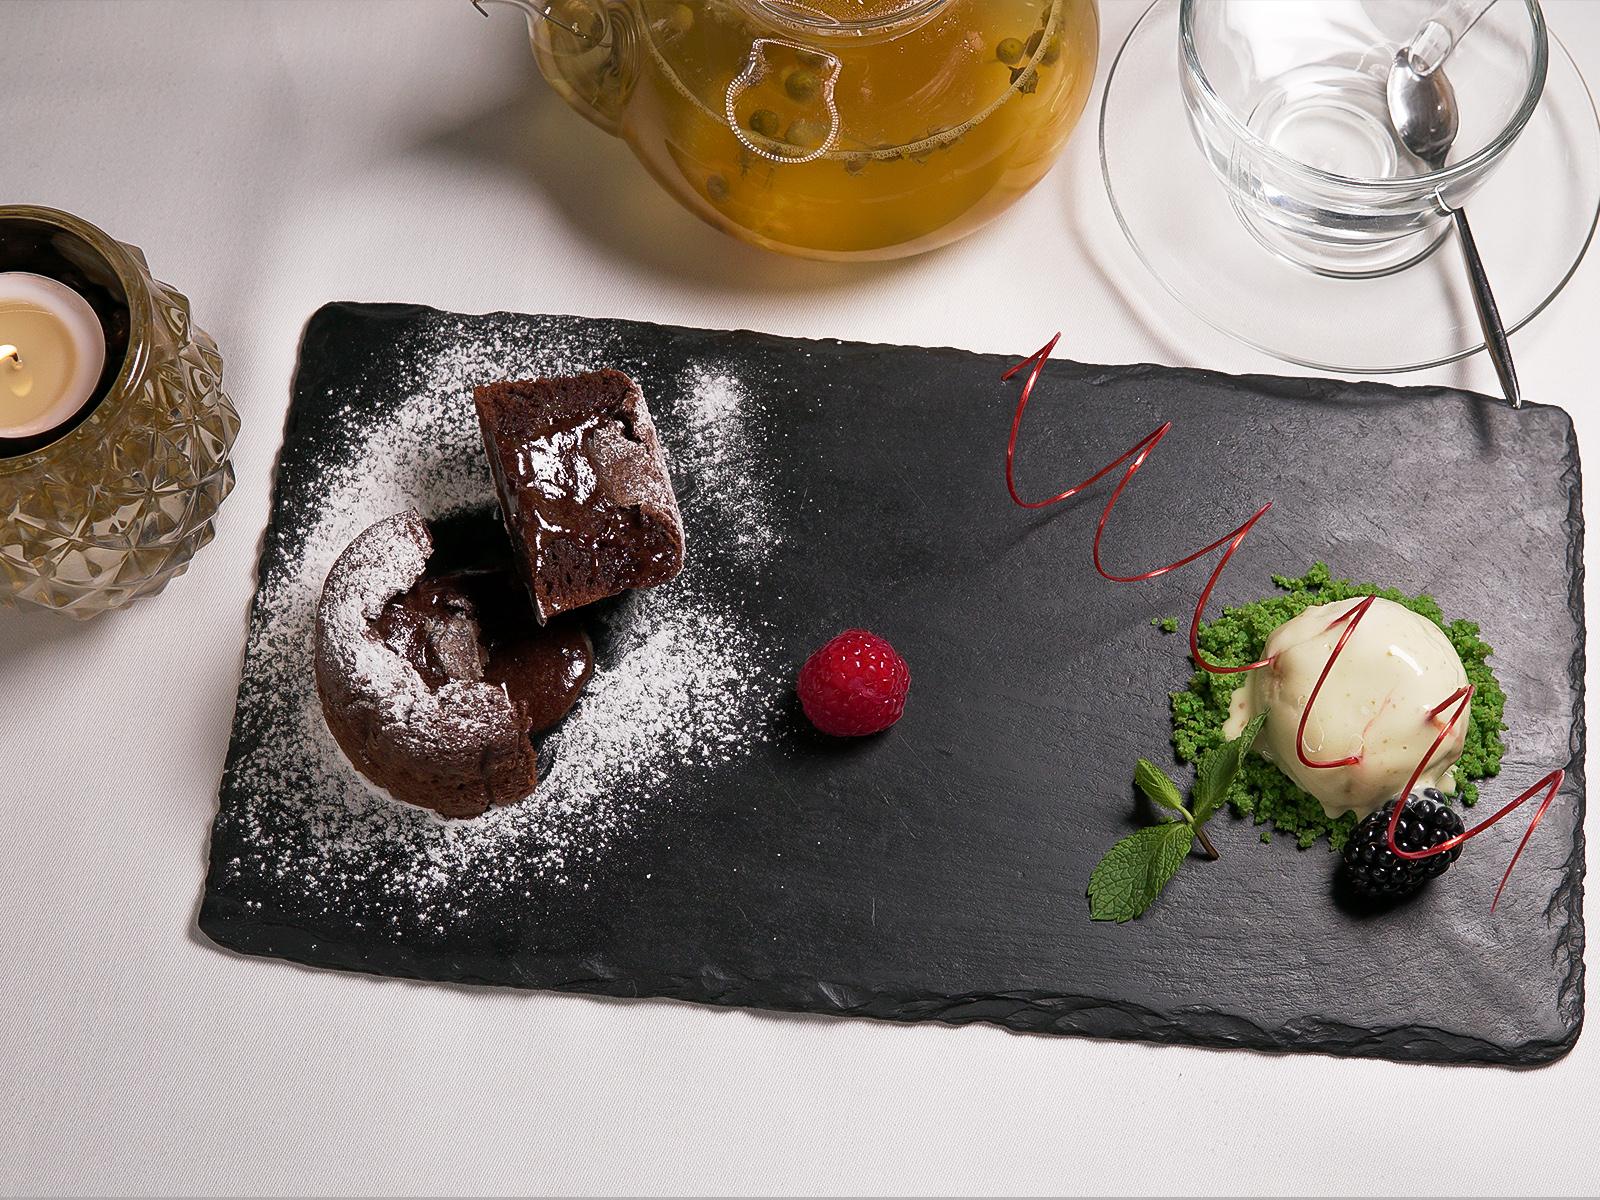 Chocolate fondant cake with pistachios